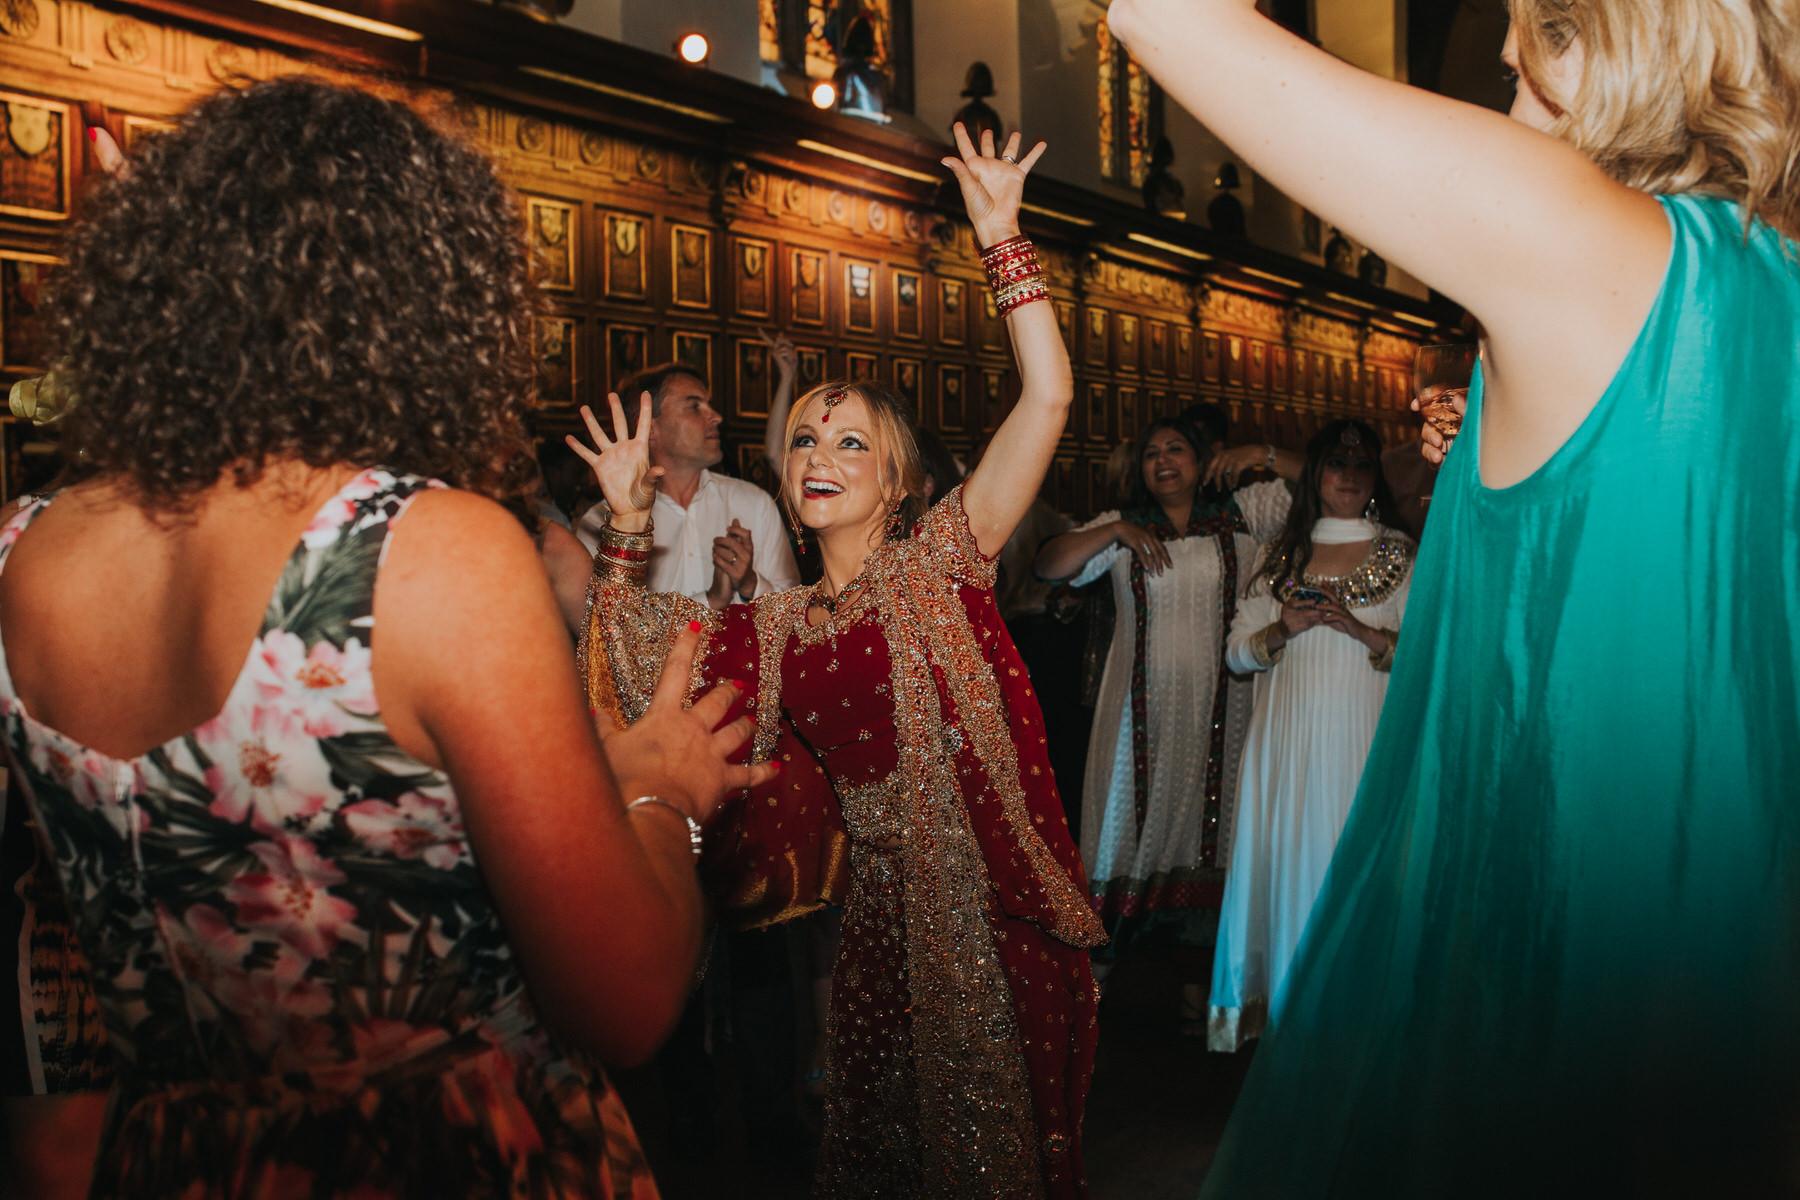 237-Anglo-Asian-wedding-bride-dancing-red-sari.jpg